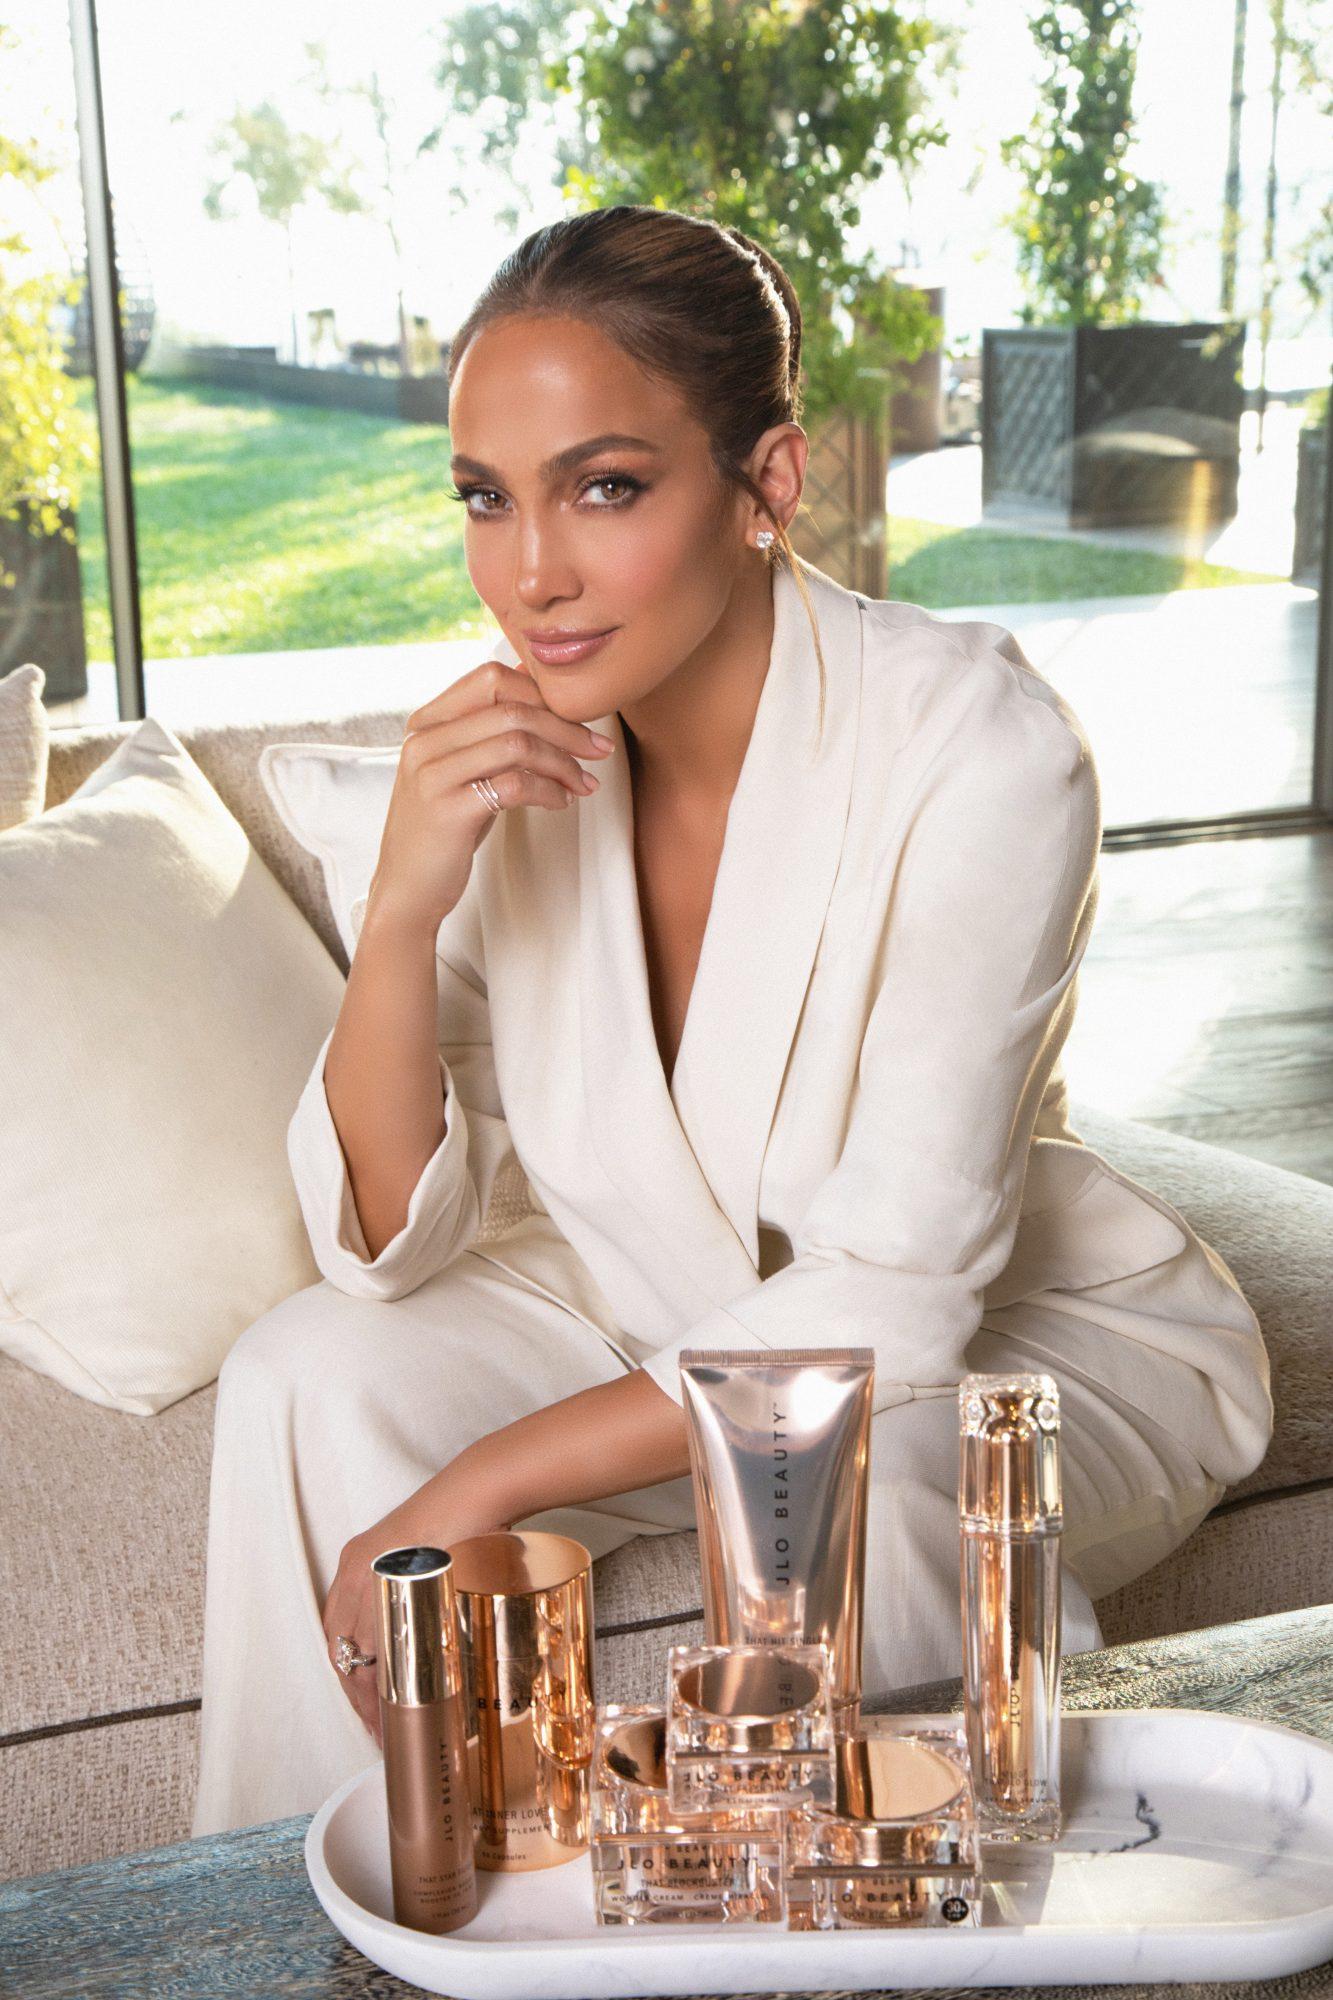 Jennifer Lopez, Jlo Beauty, Jennifer Lopez linea de belleza, productos de belleza